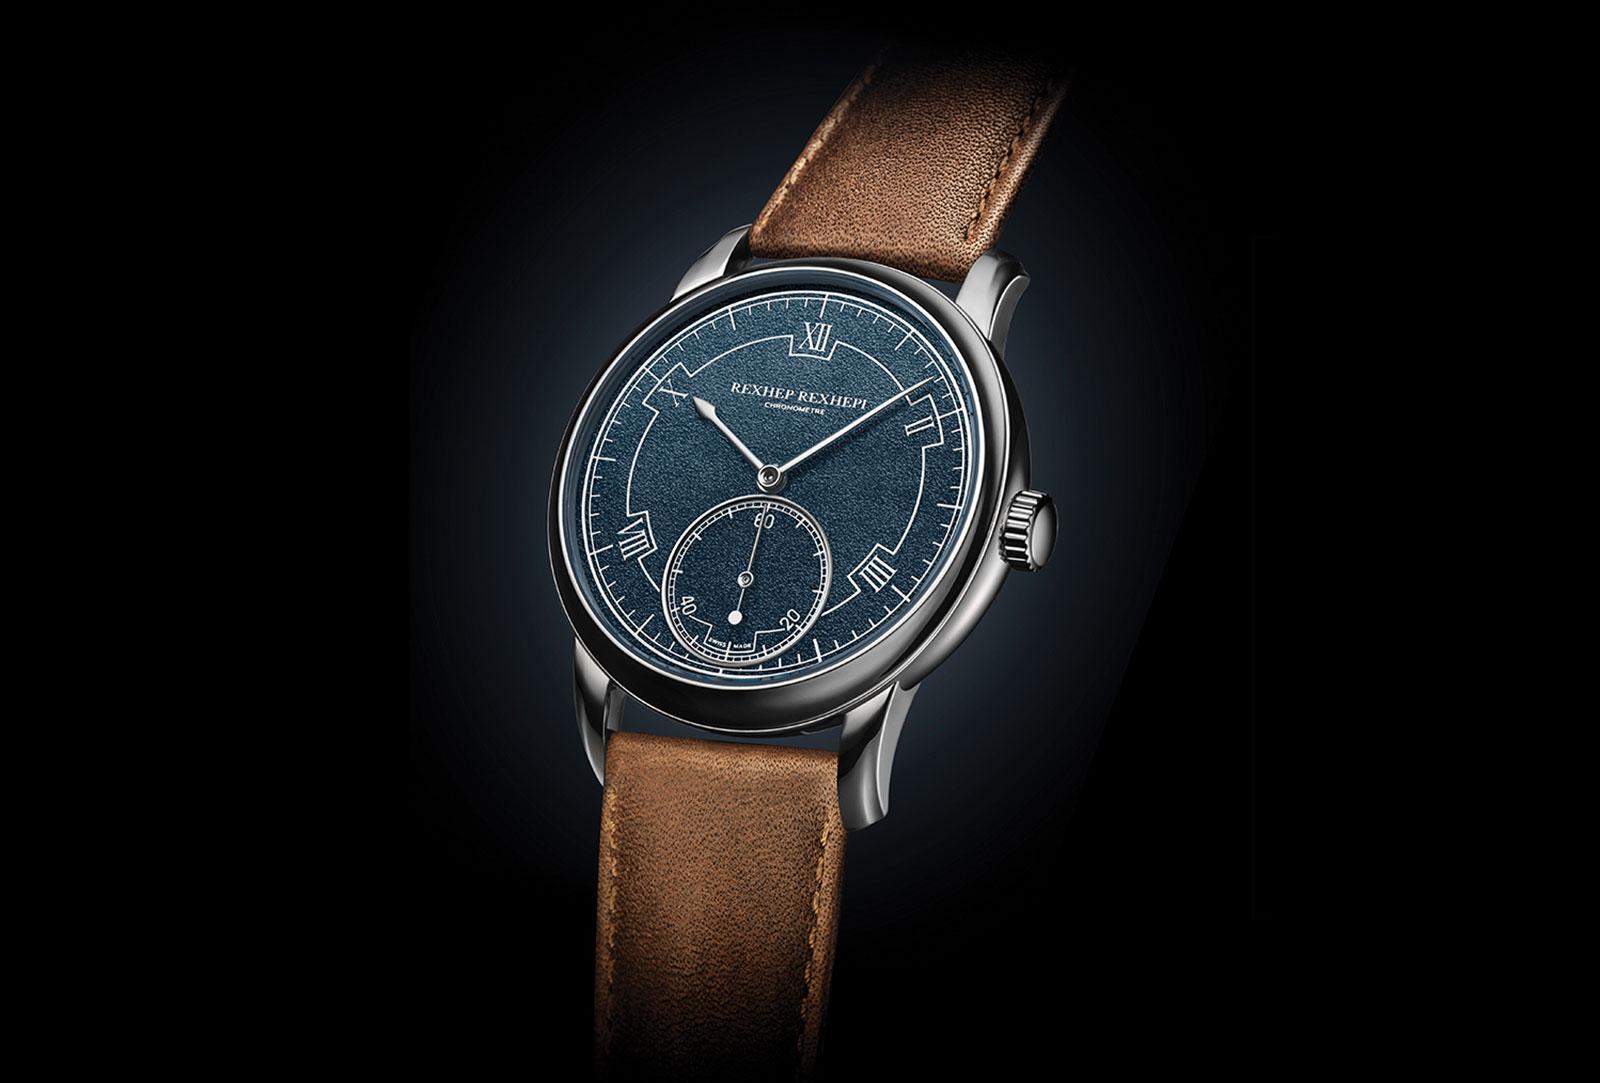 akrivia Chronometre Contemporain Only Watch